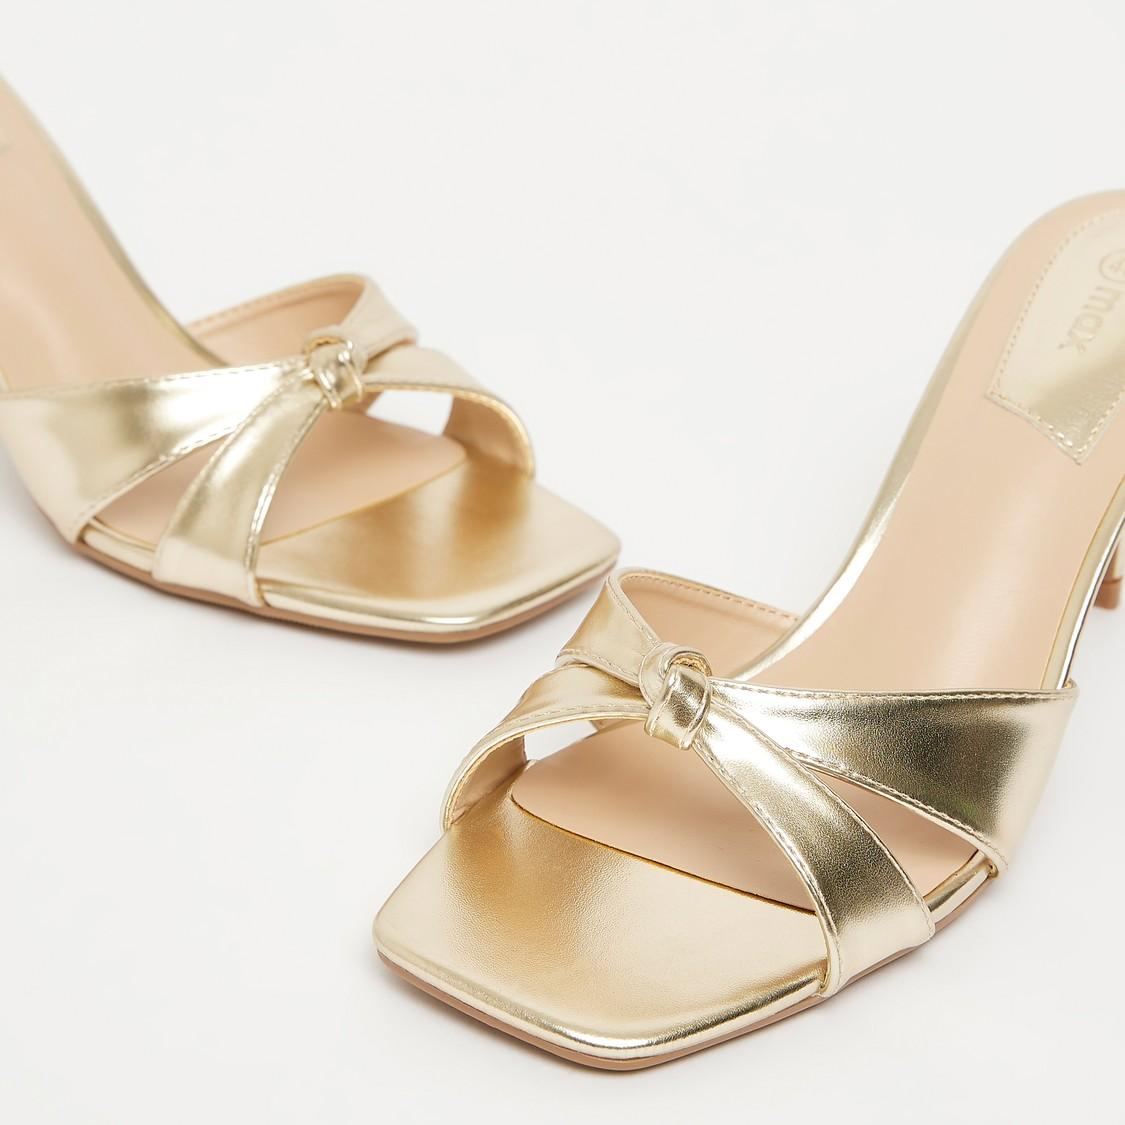 Cross Strap Slip-On Sandals with Stiletto Heels